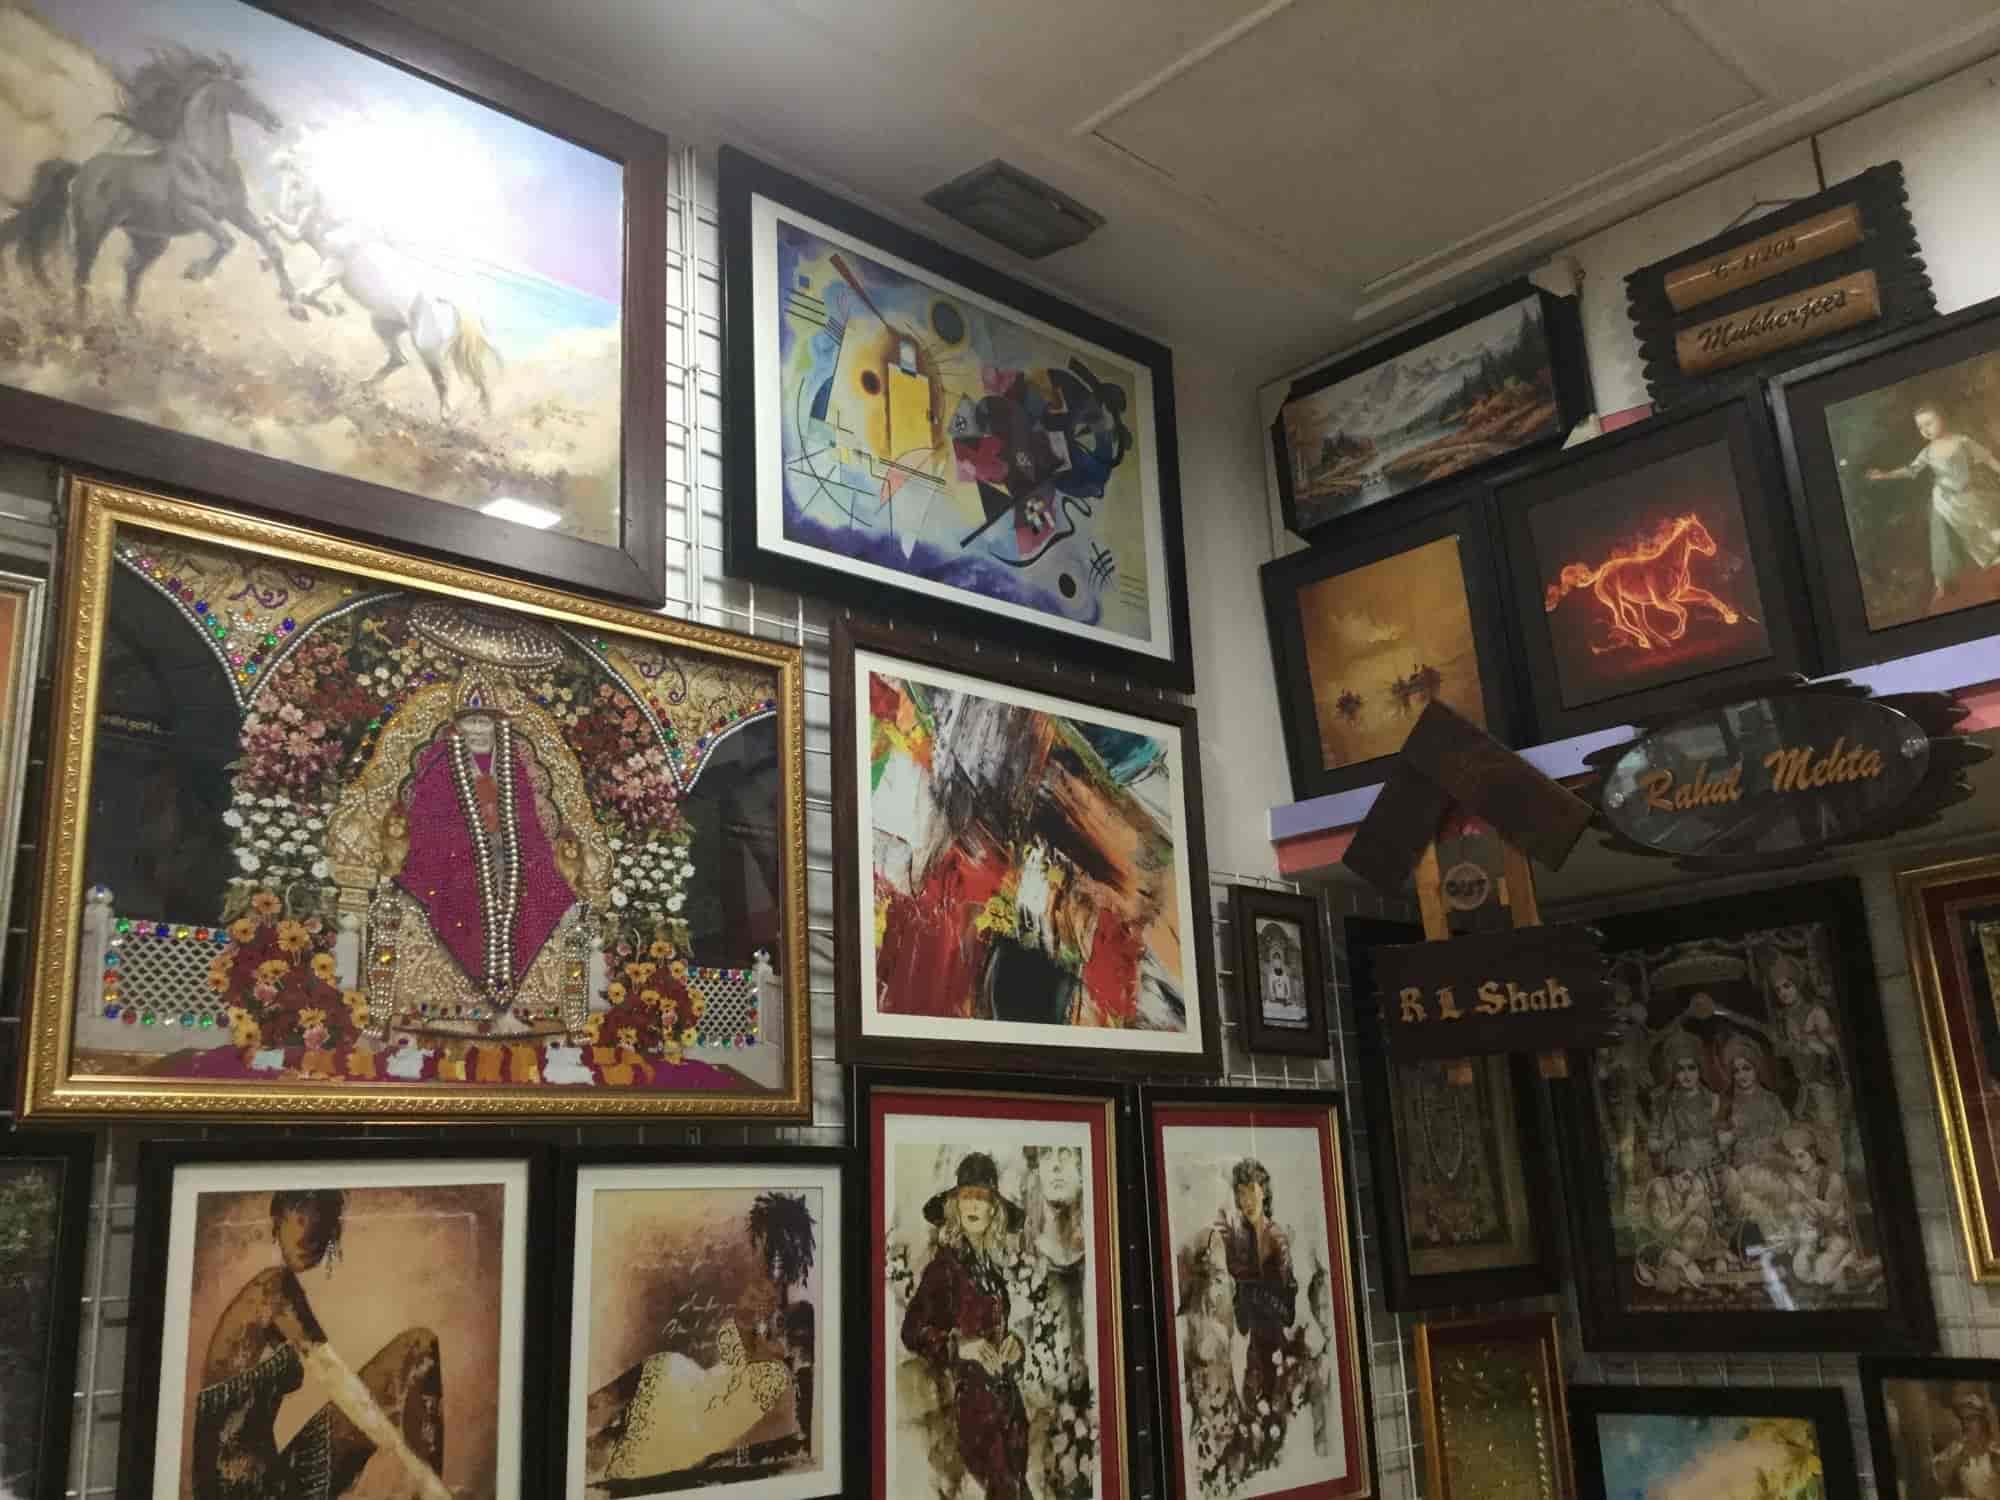 metro frames art gallery malad east art galleries in mumbai justdial - Metro Frames